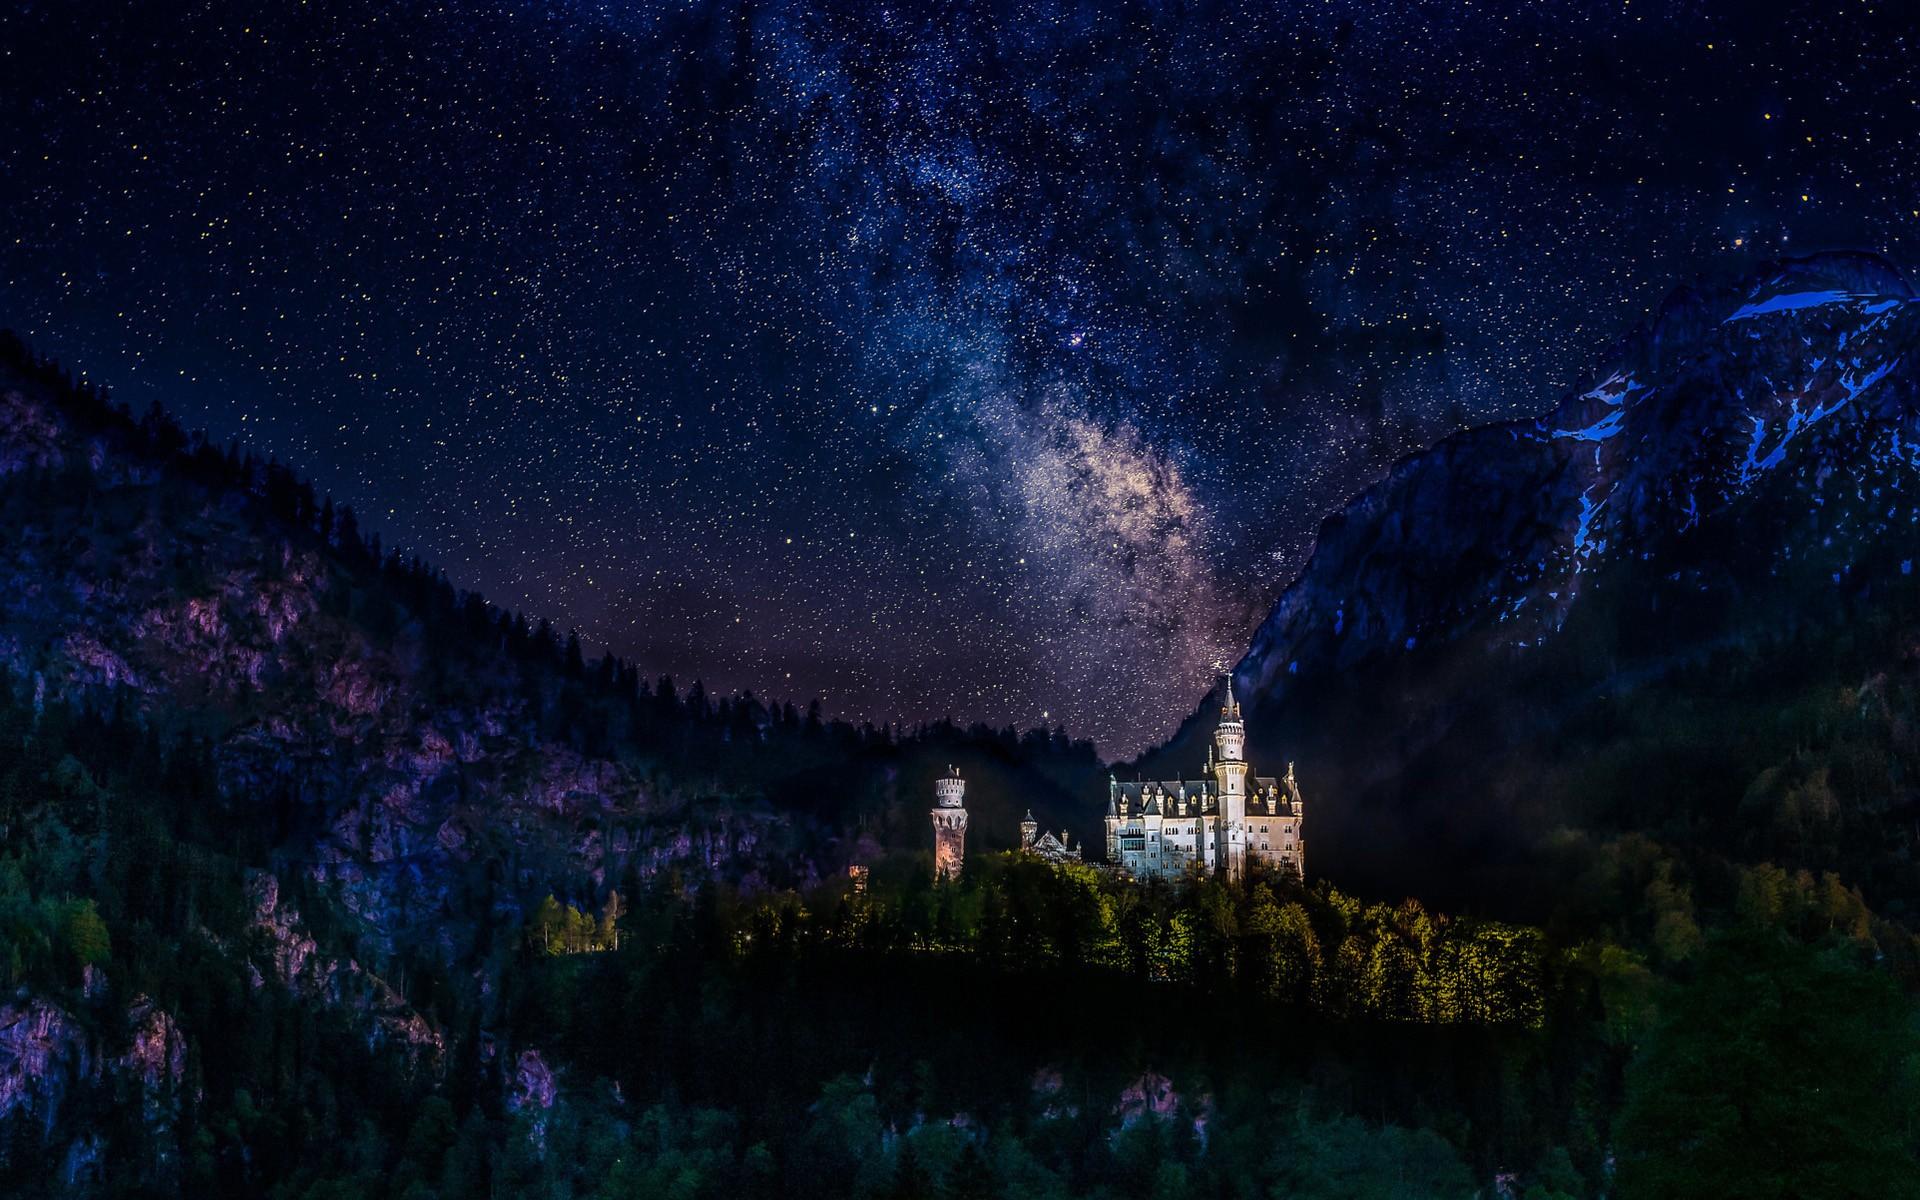 neuschwanstein castle hd world 4k wallpapers images